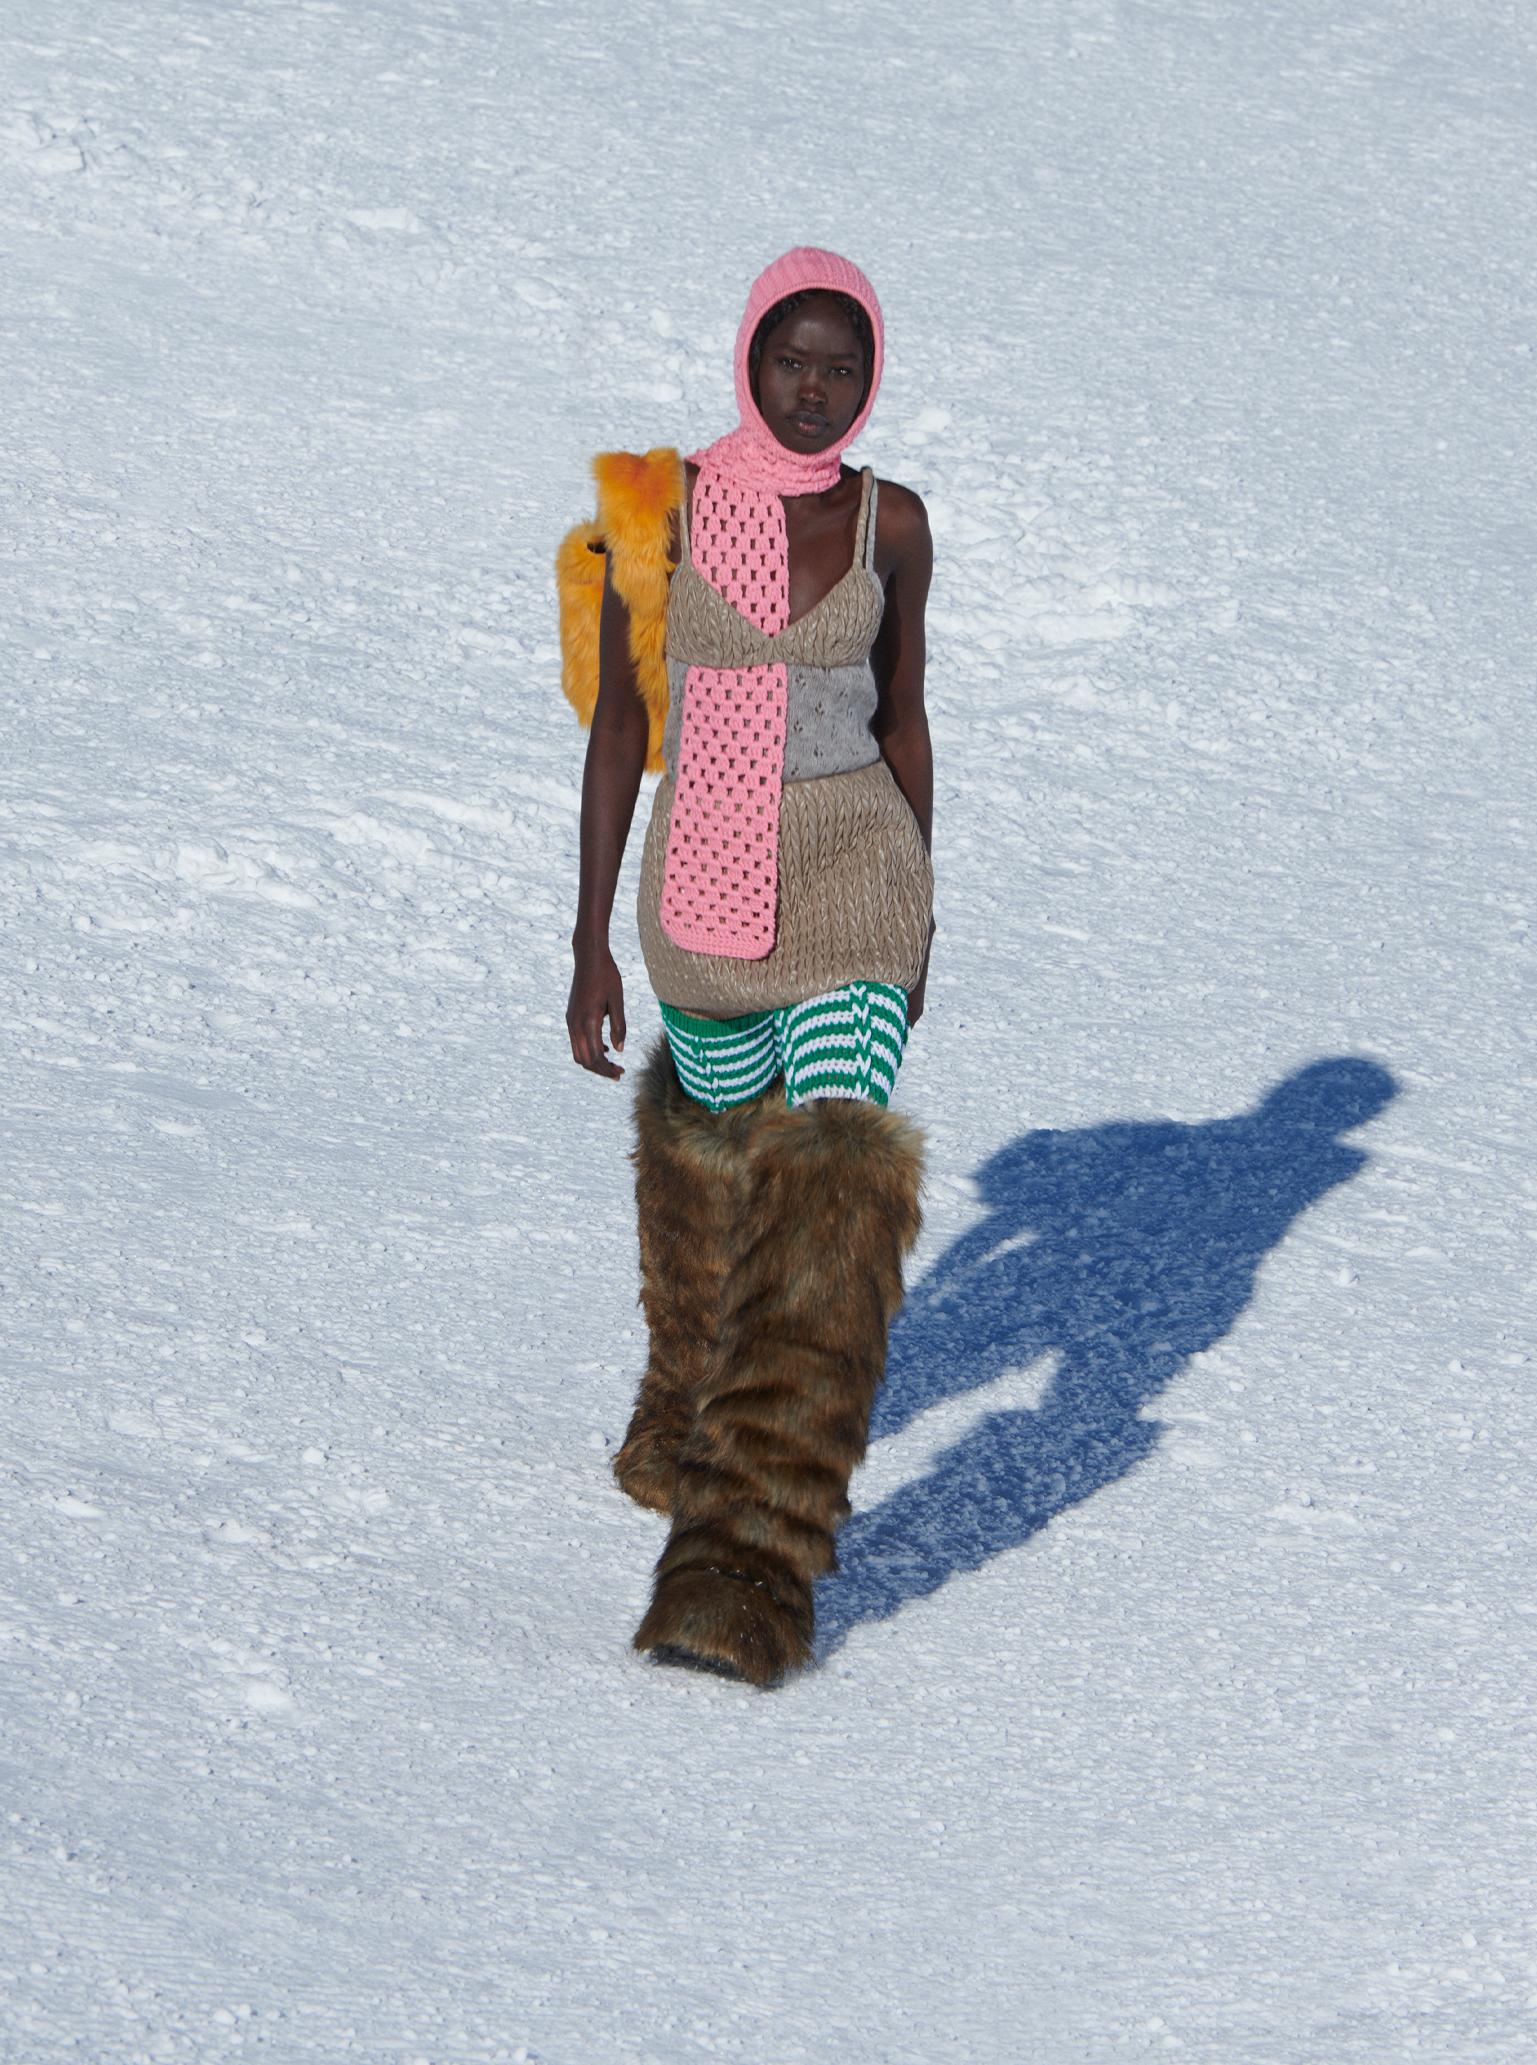 Digital paris fashion week Miu Miu outerwear and fur boots